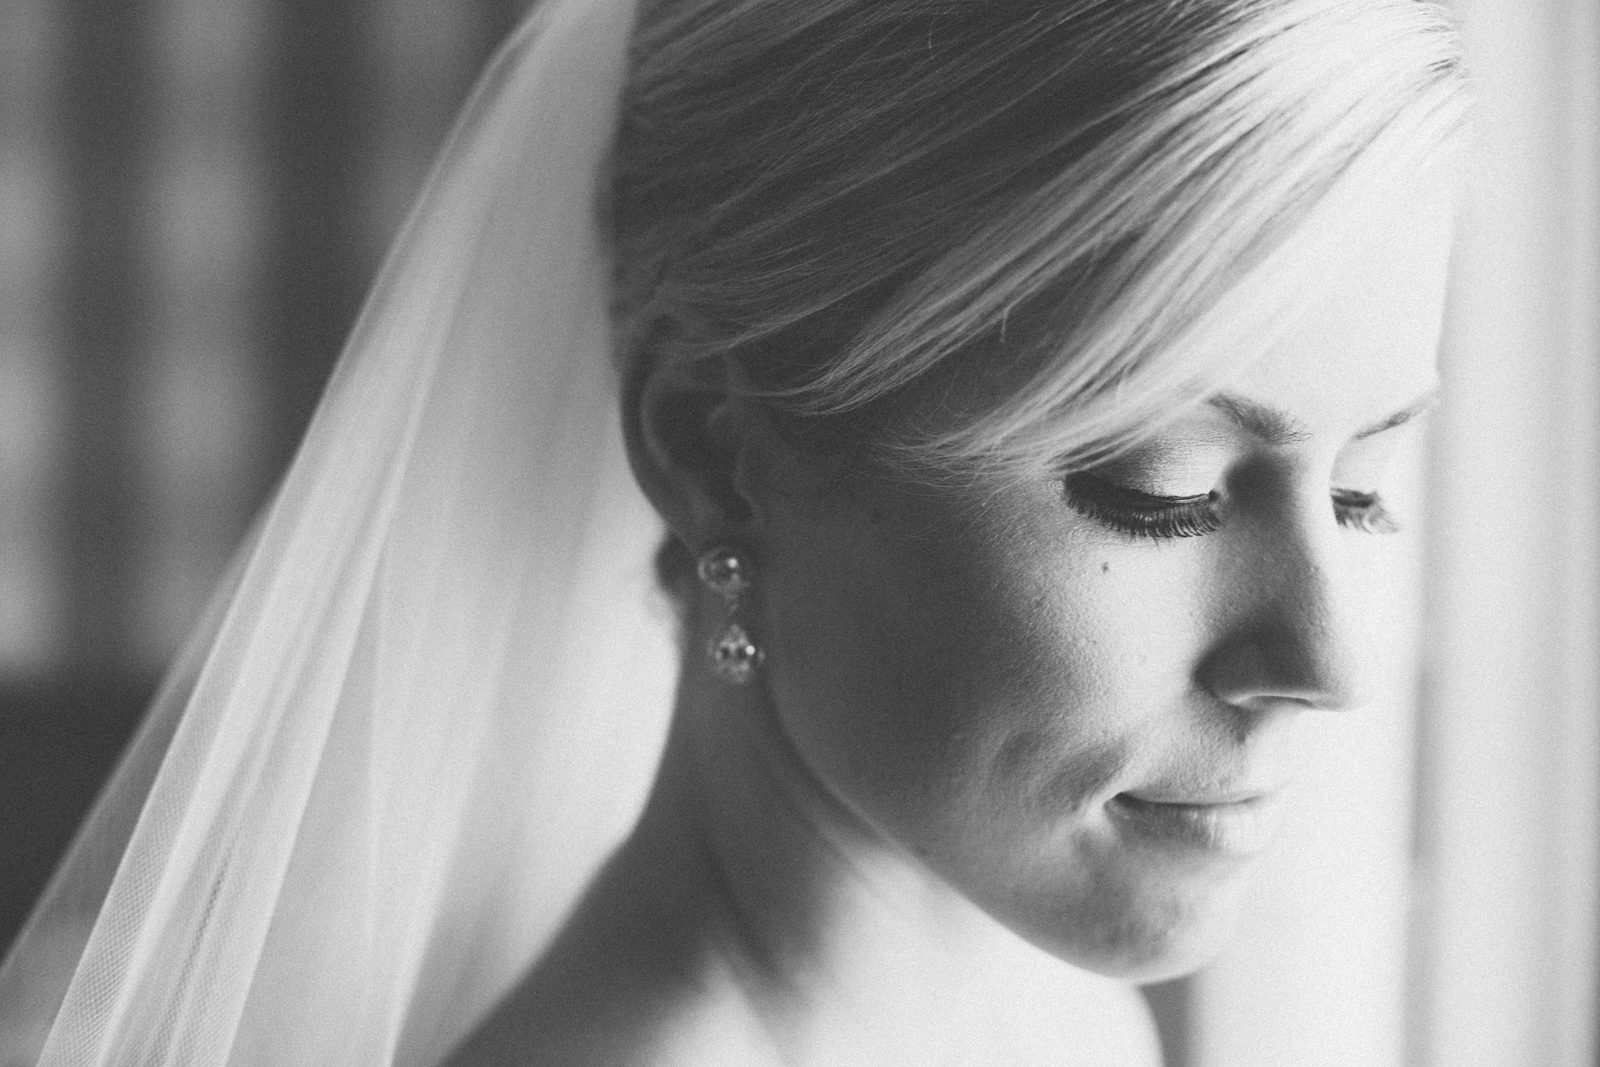 Window light bridal portrait